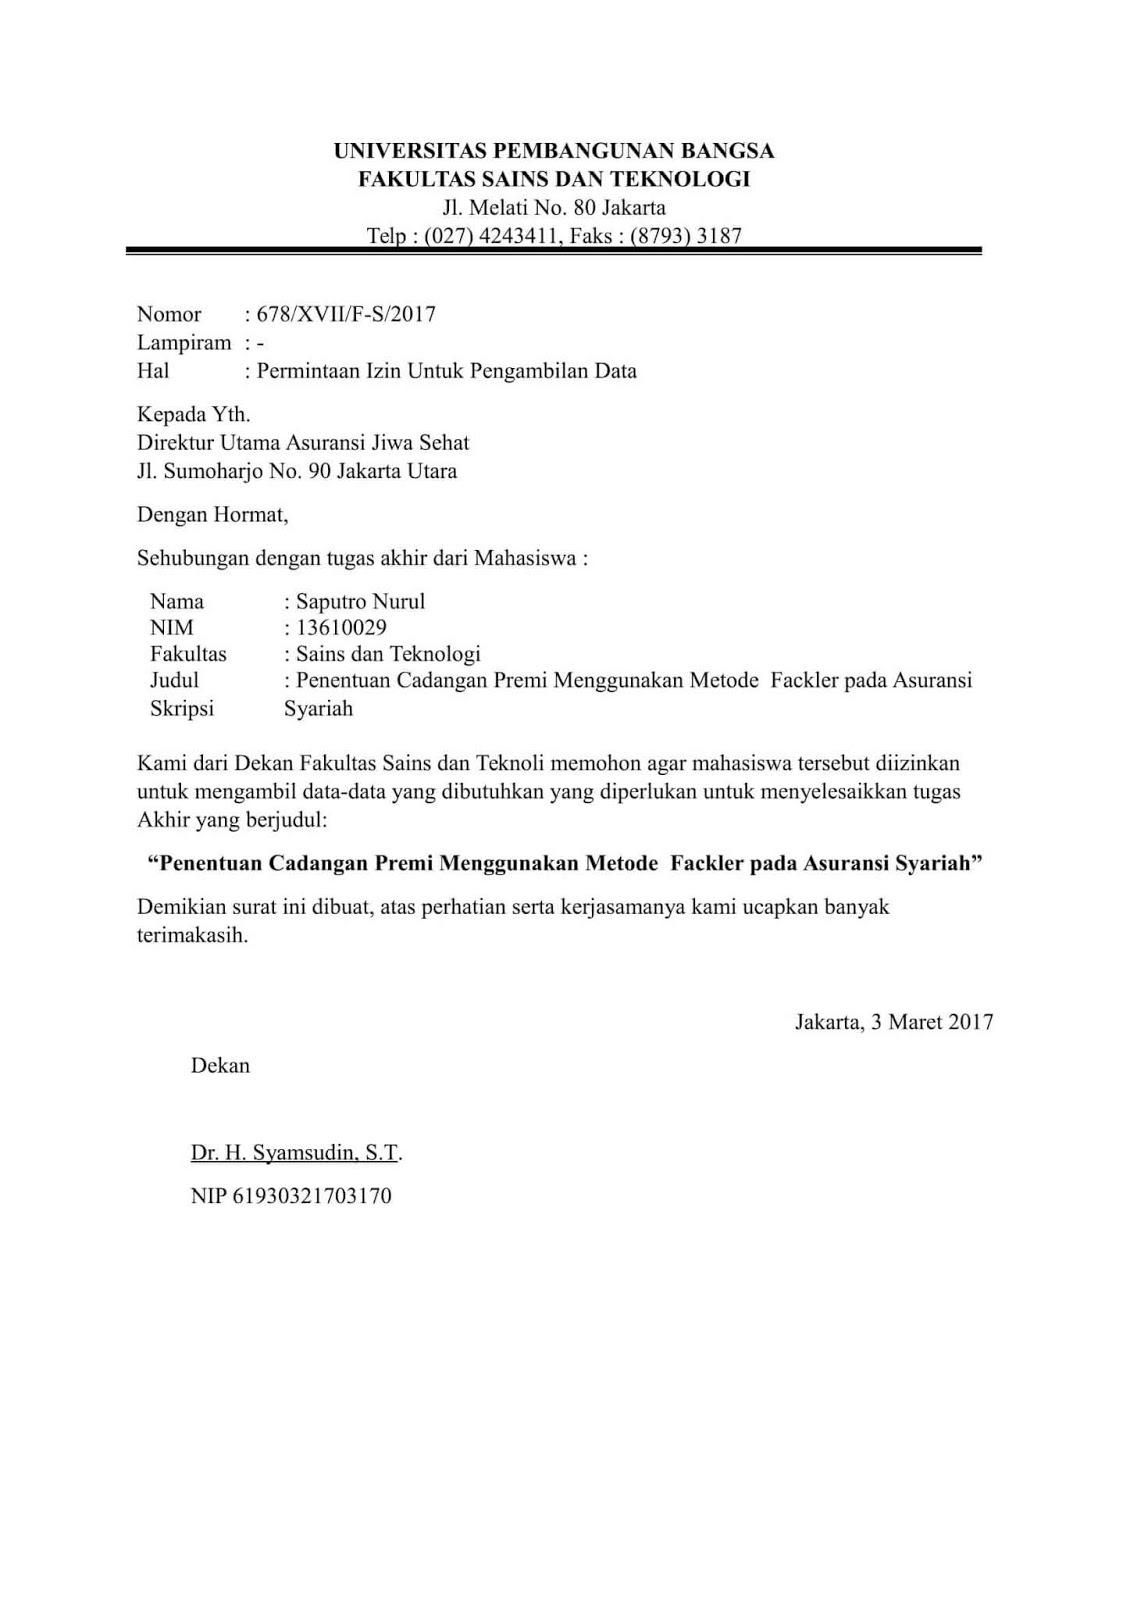 Contoh Surat Pengantar Kerja